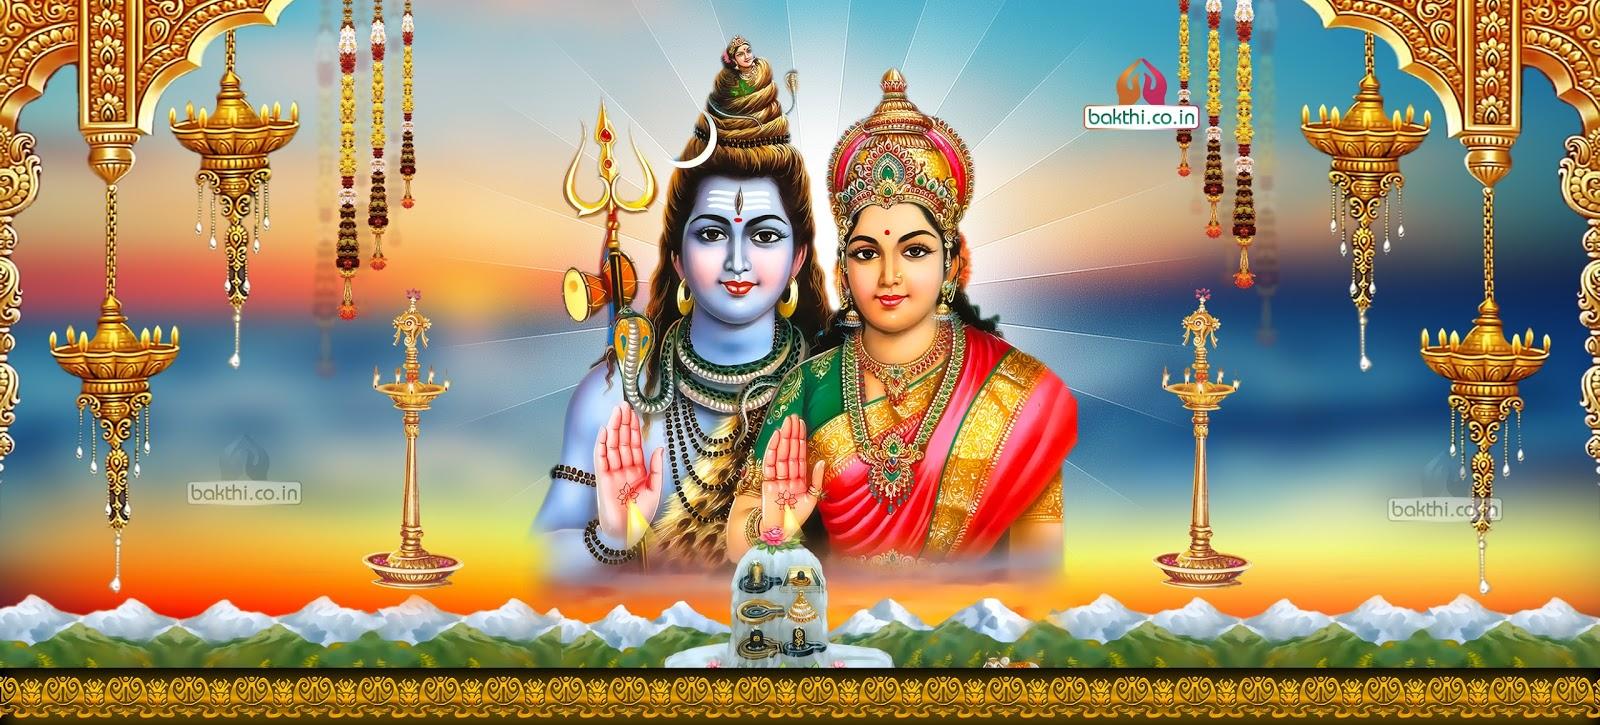 Shiva Parvati Images In Hd Vinnyoleo Vegetalinfo